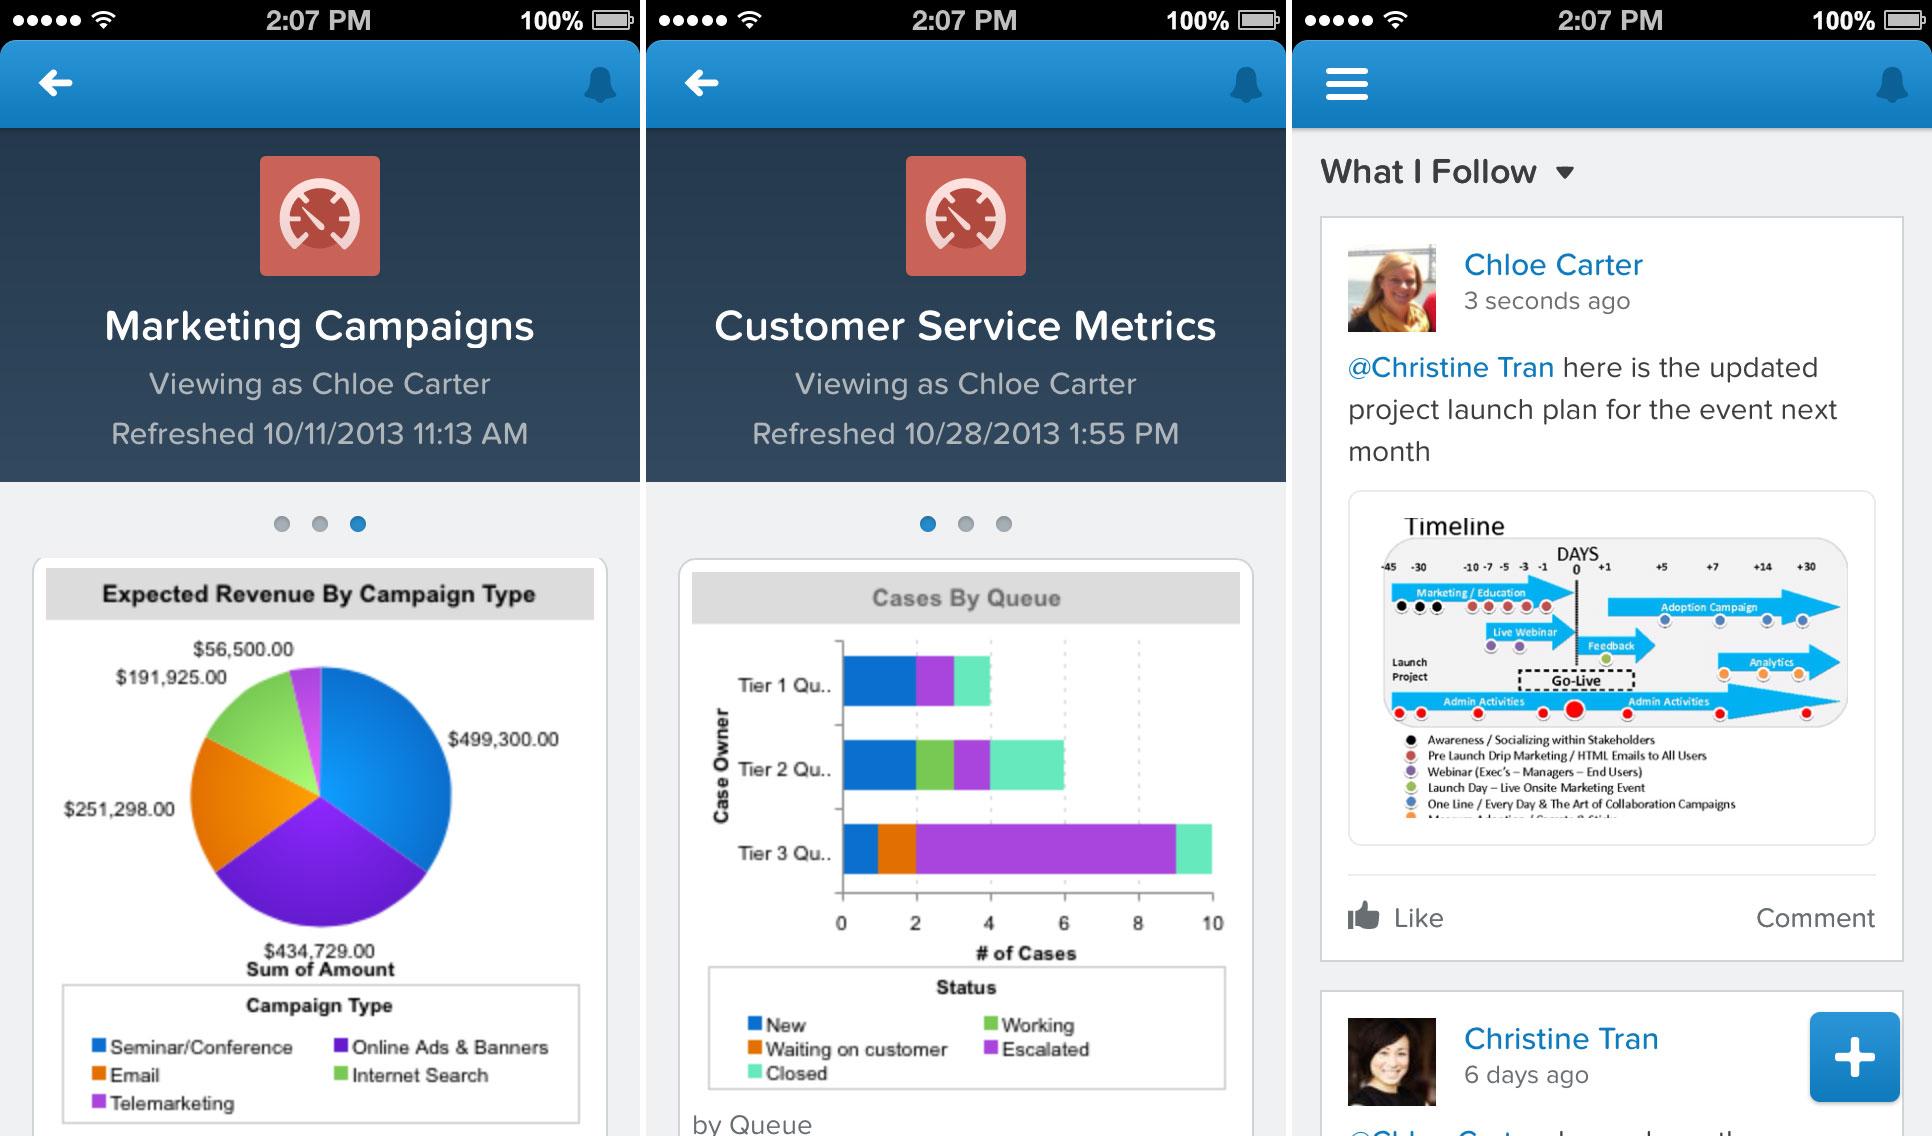 Salesforce: Meet Salesforce1: A New CRM Platform To Help Companies